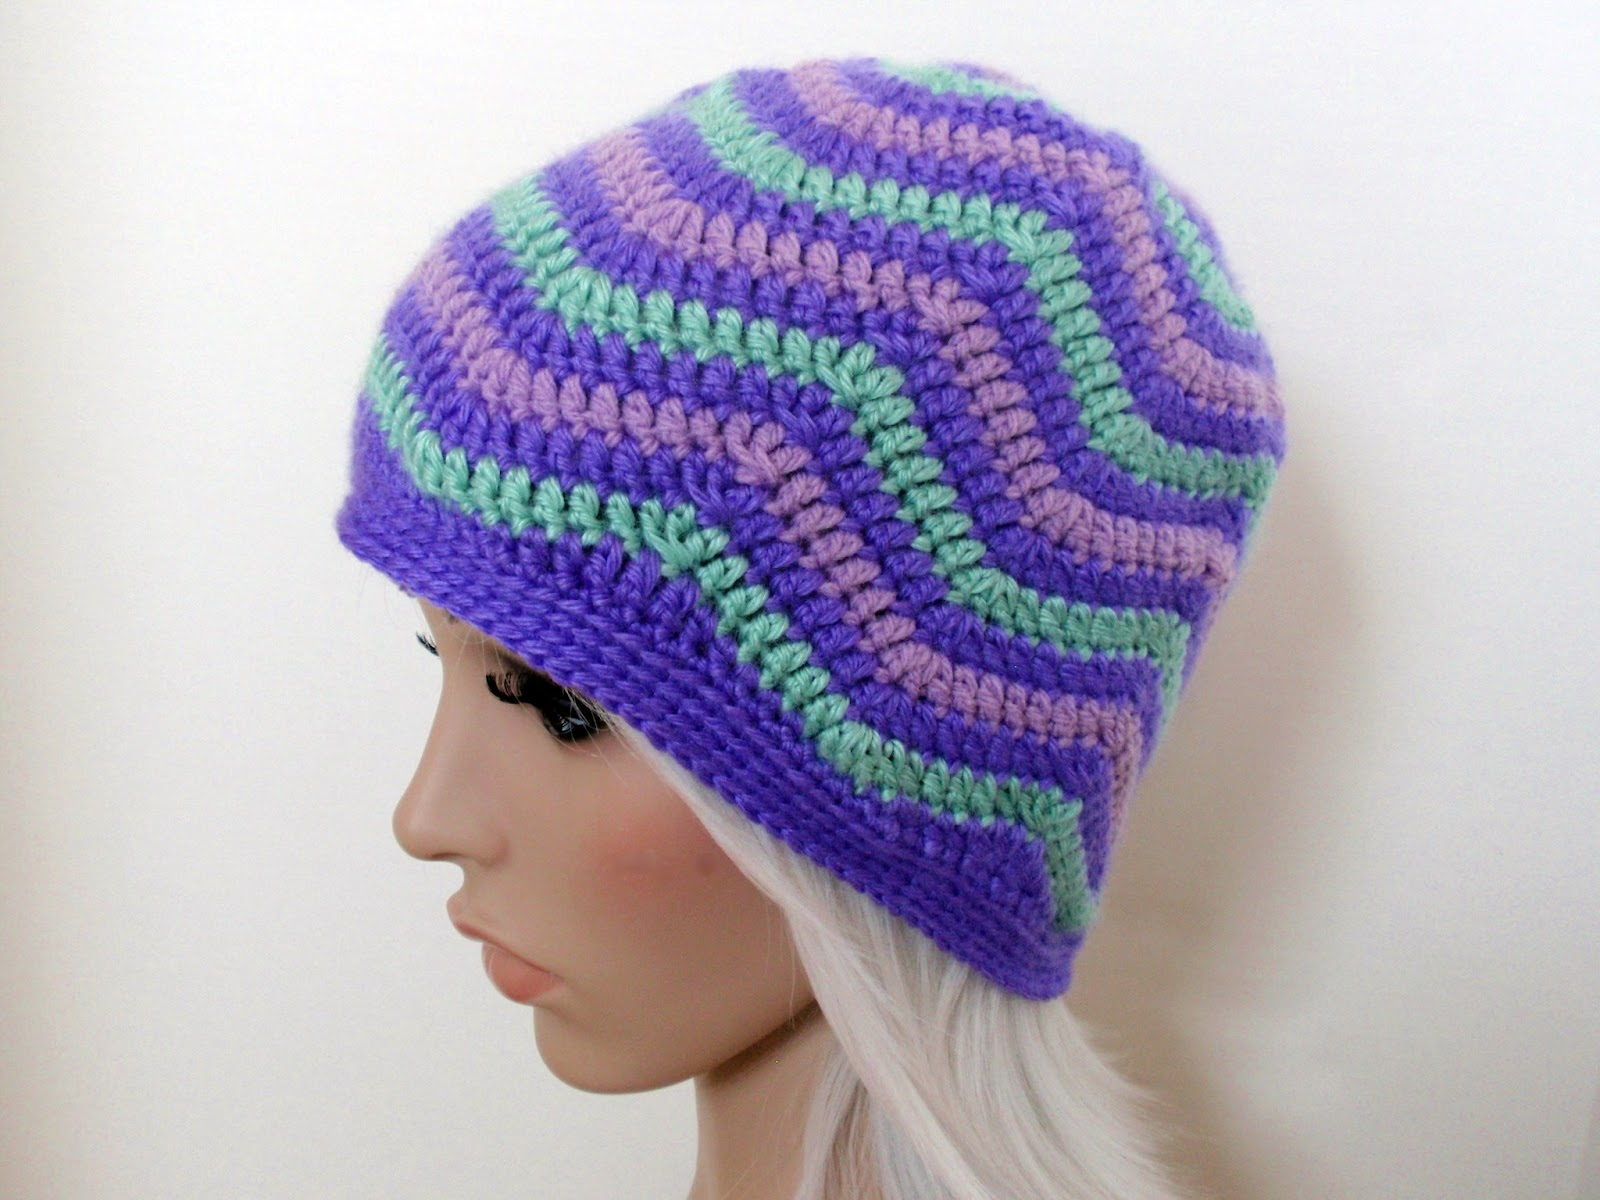 Zig Zag Hat Knitting Pattern : Jenn Likes Yarn - The Knit and Crochet Blog: spring themed ...